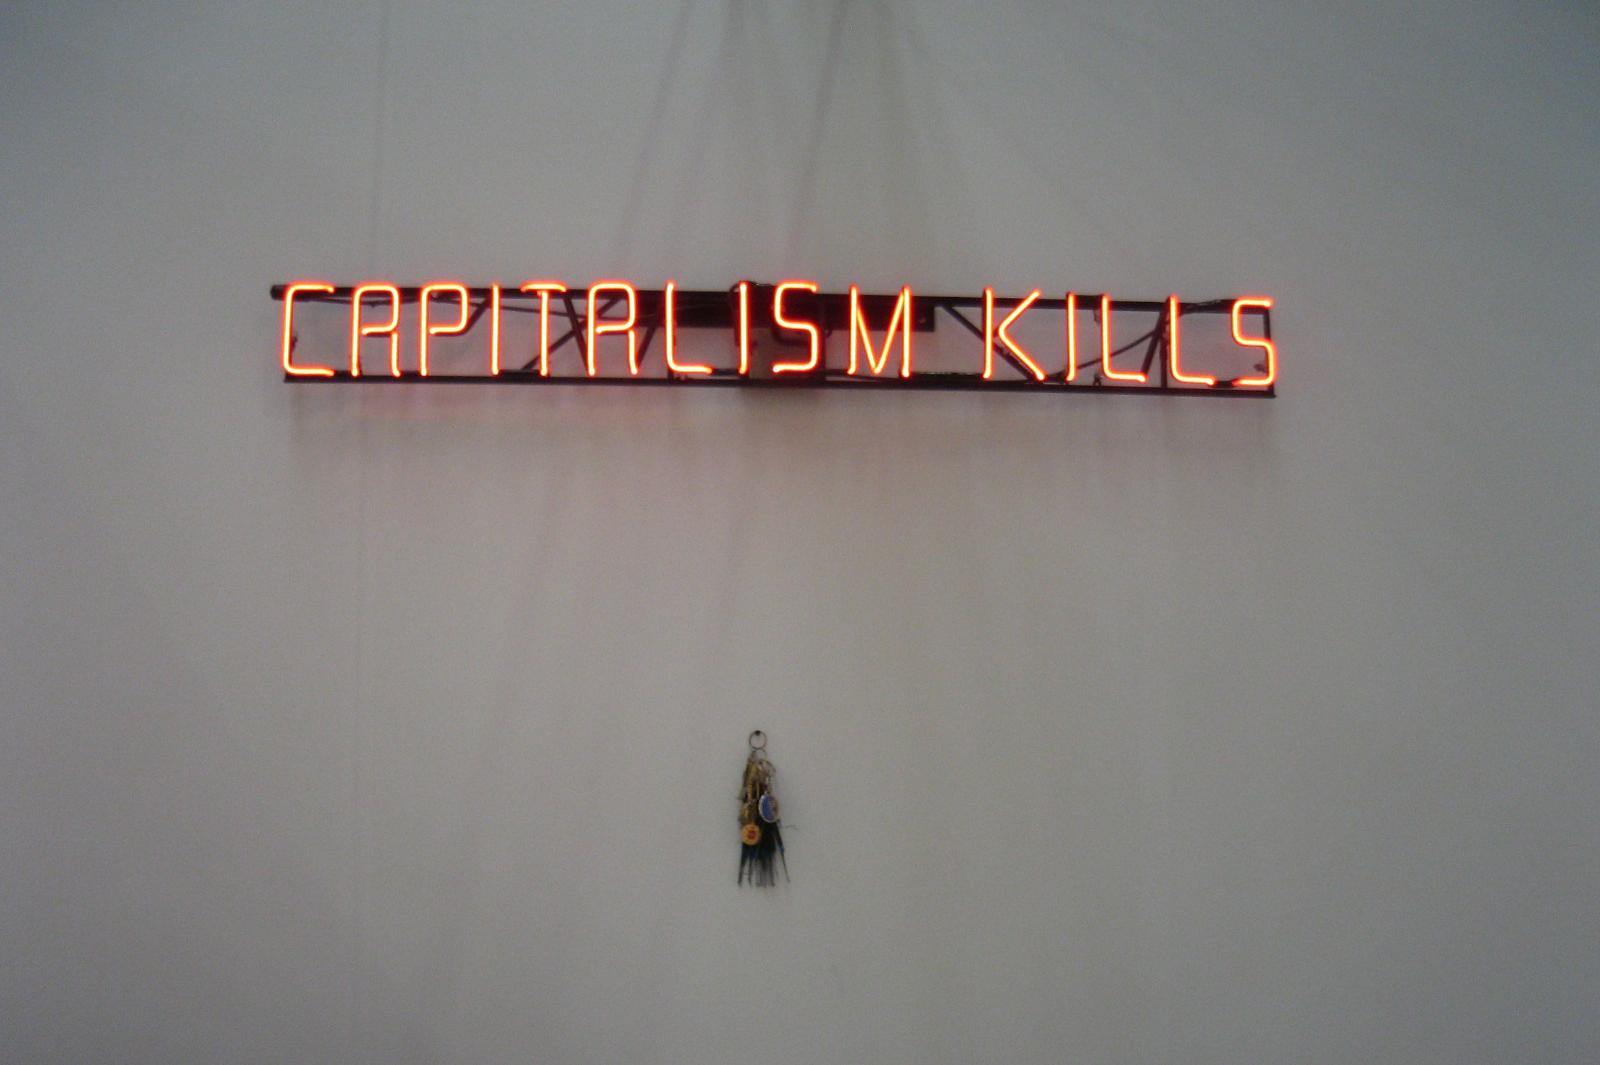 capitalism-kills